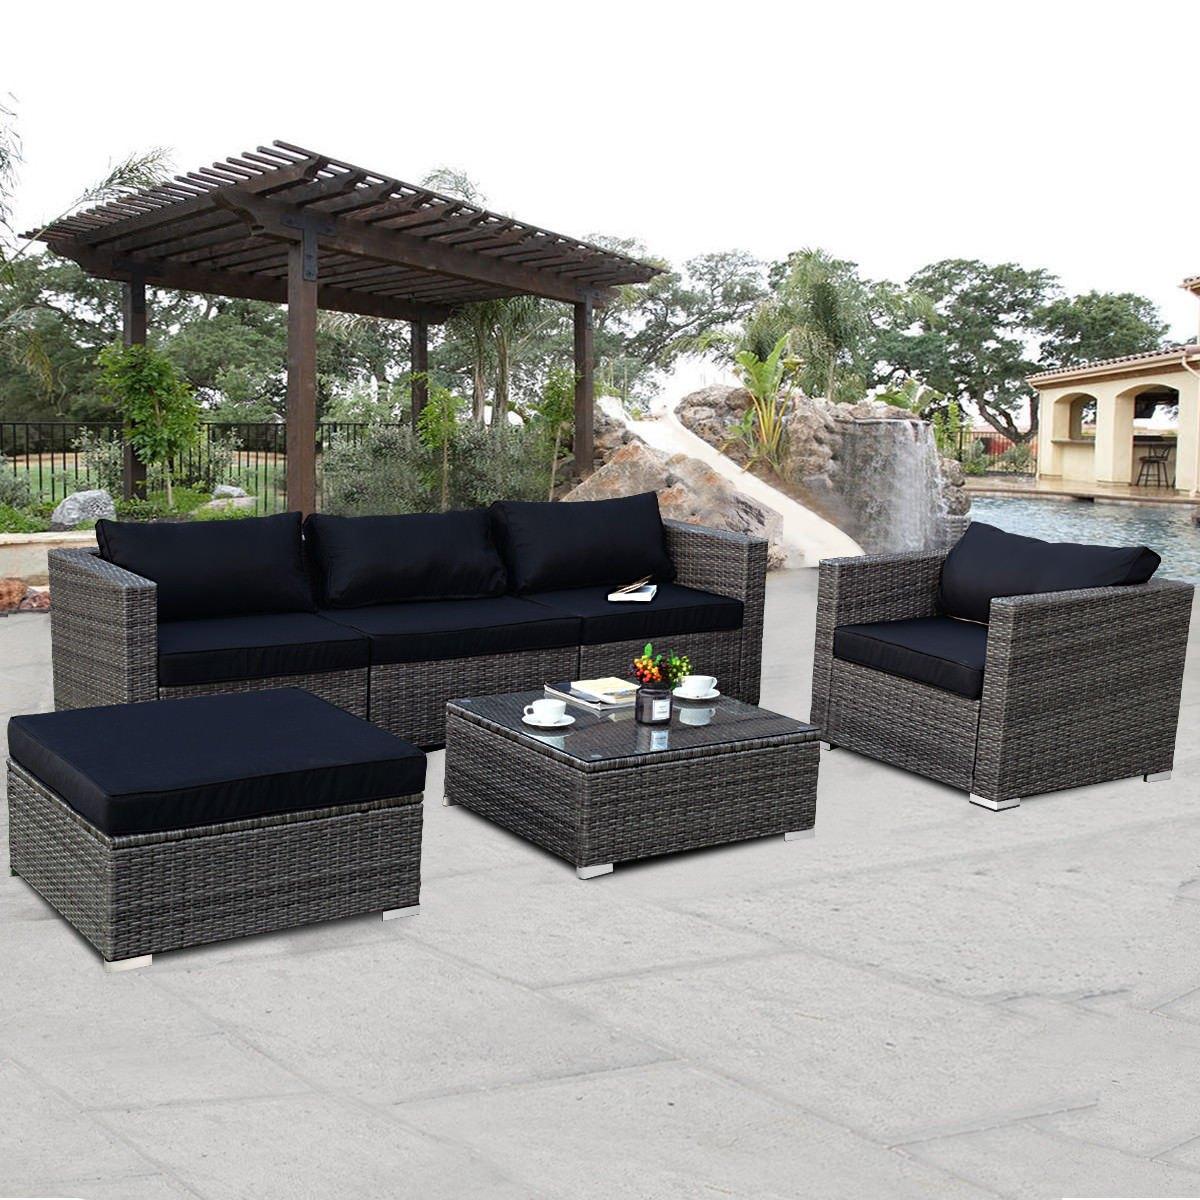 costway 6-piece rattan wicker patio furniture set sectional sofa couch yard EKJVVTC